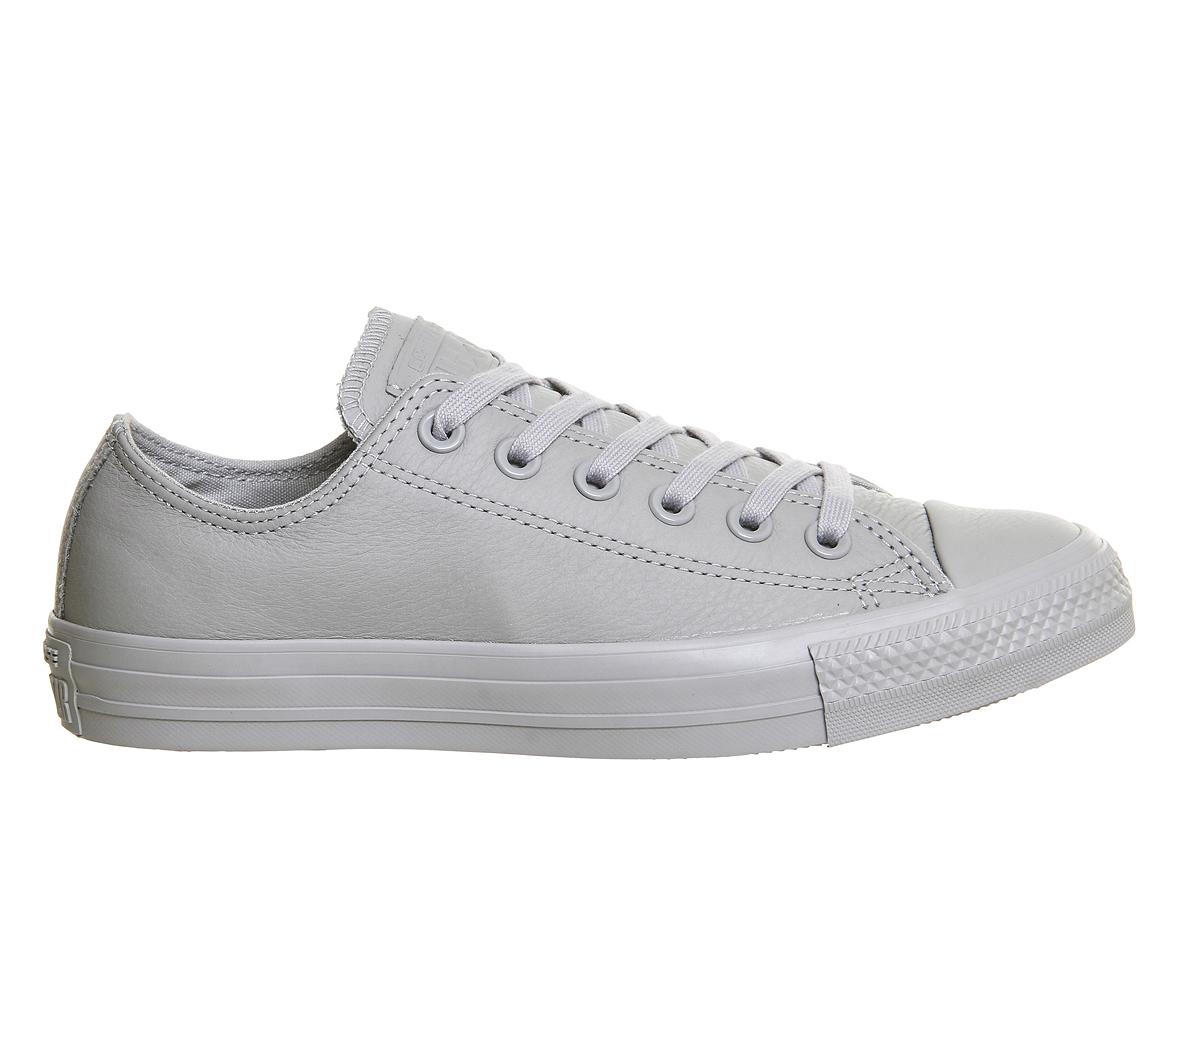 Black Griday Converse Shoes